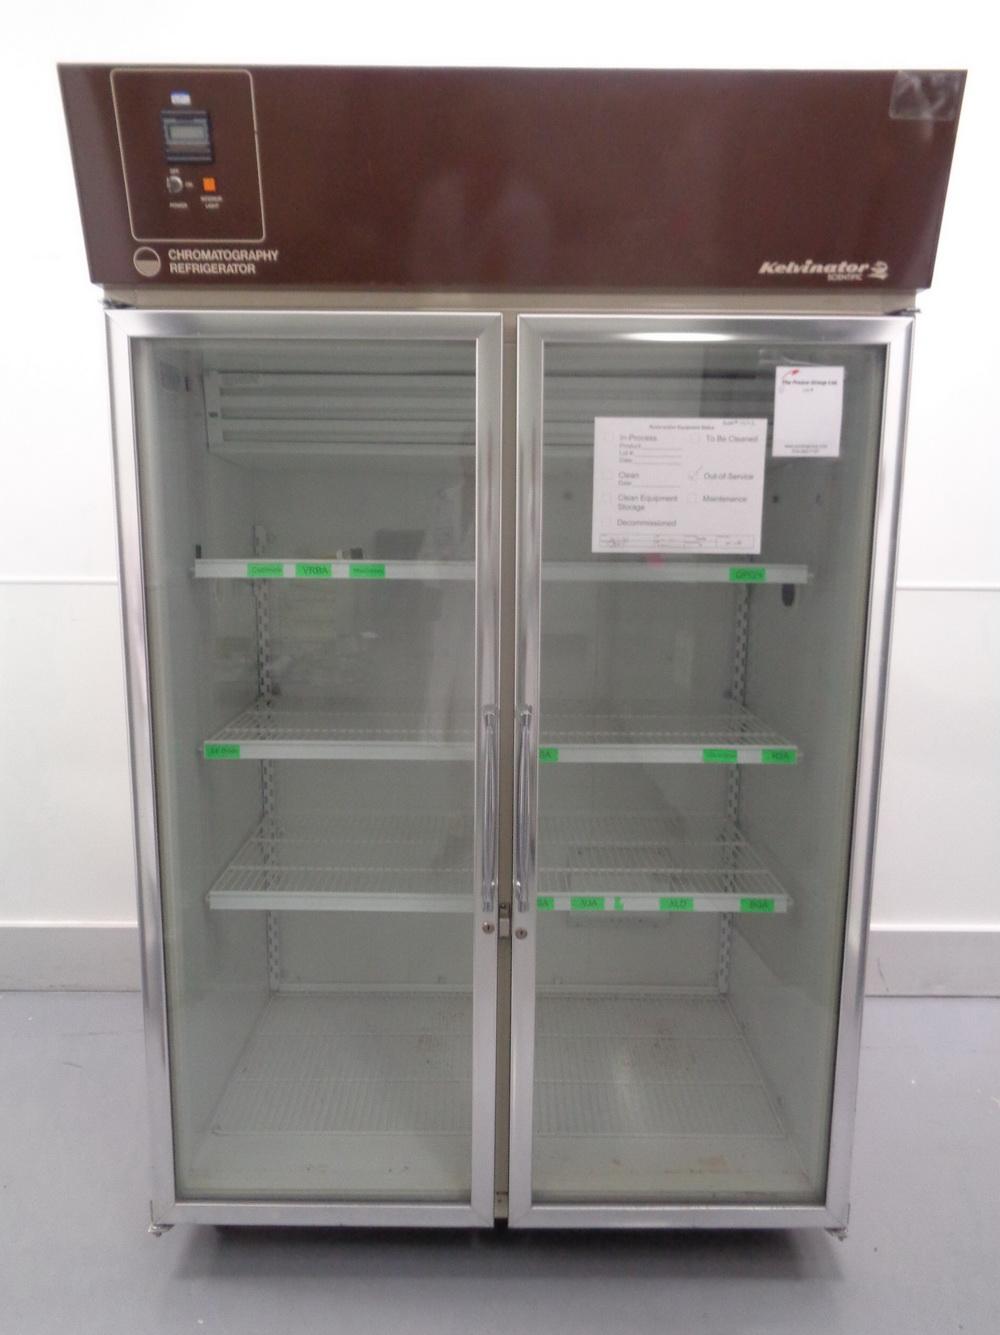 Lot 26 Kelvinator Scientific Double Glass Door Chromatography Refrigerator